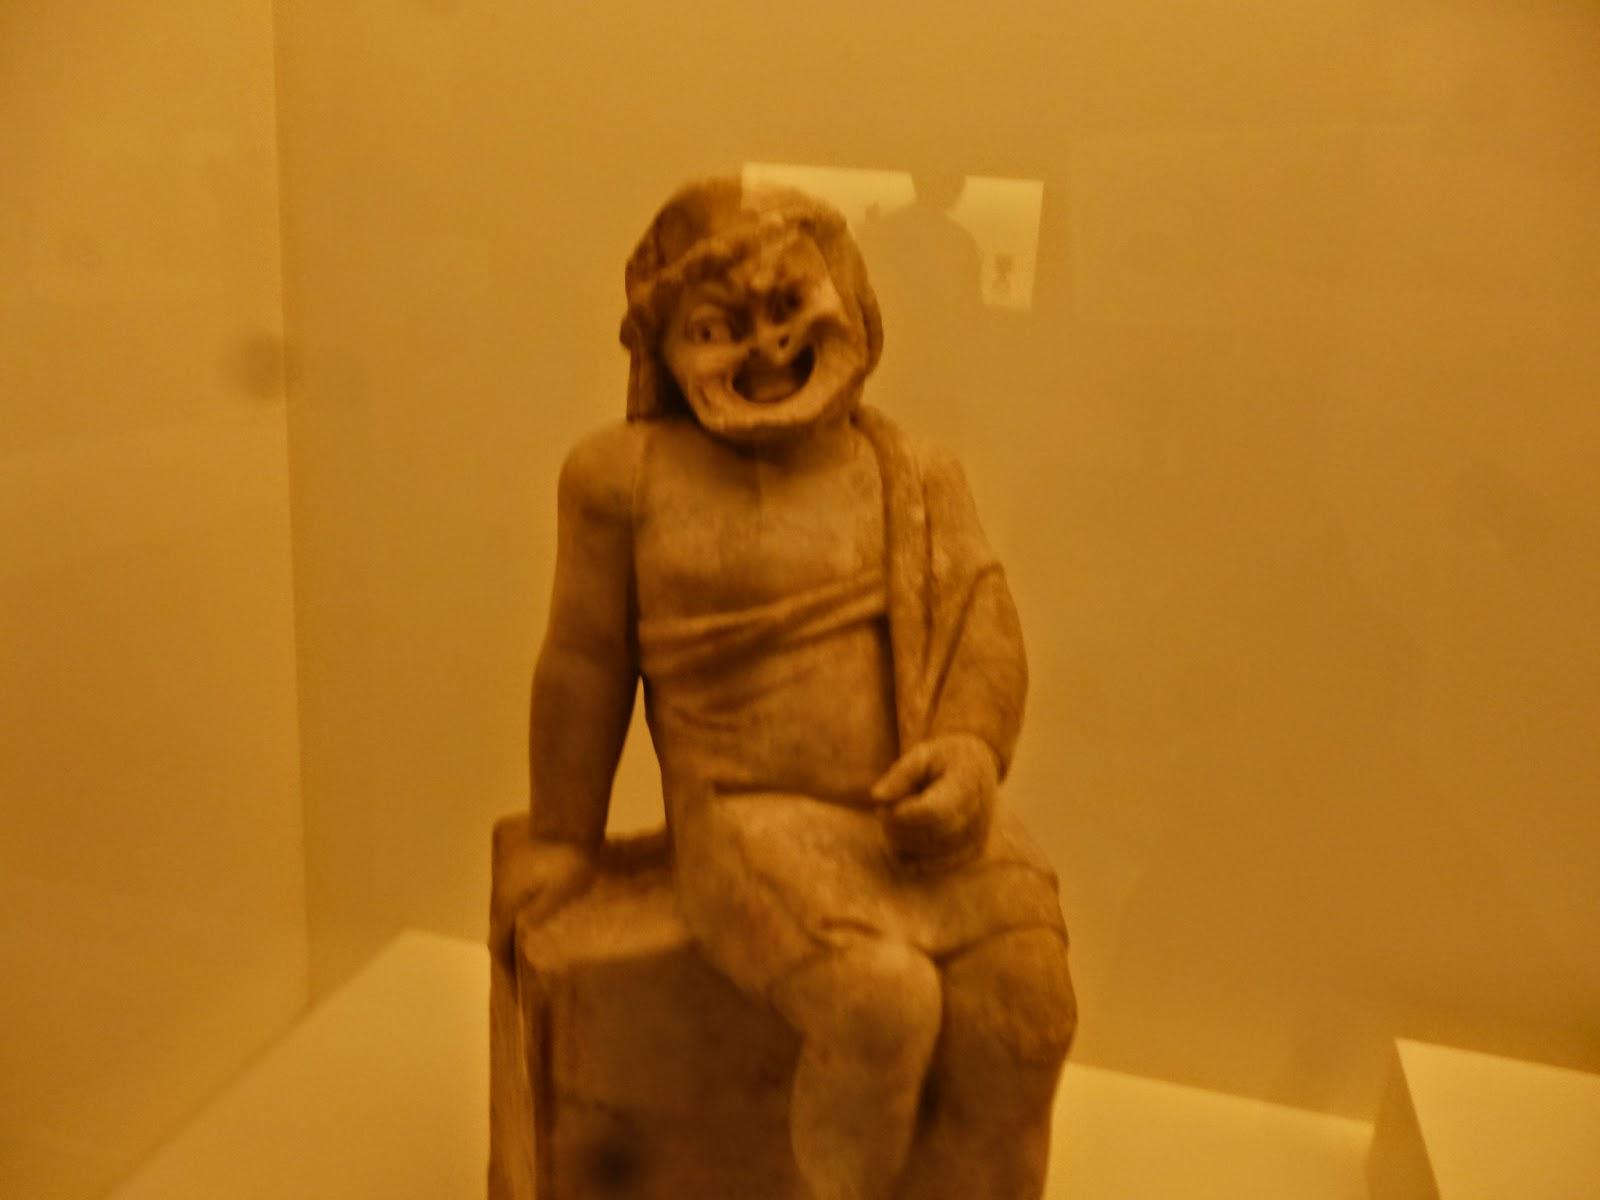 Laughing Statue - Bendigo Art Gallery